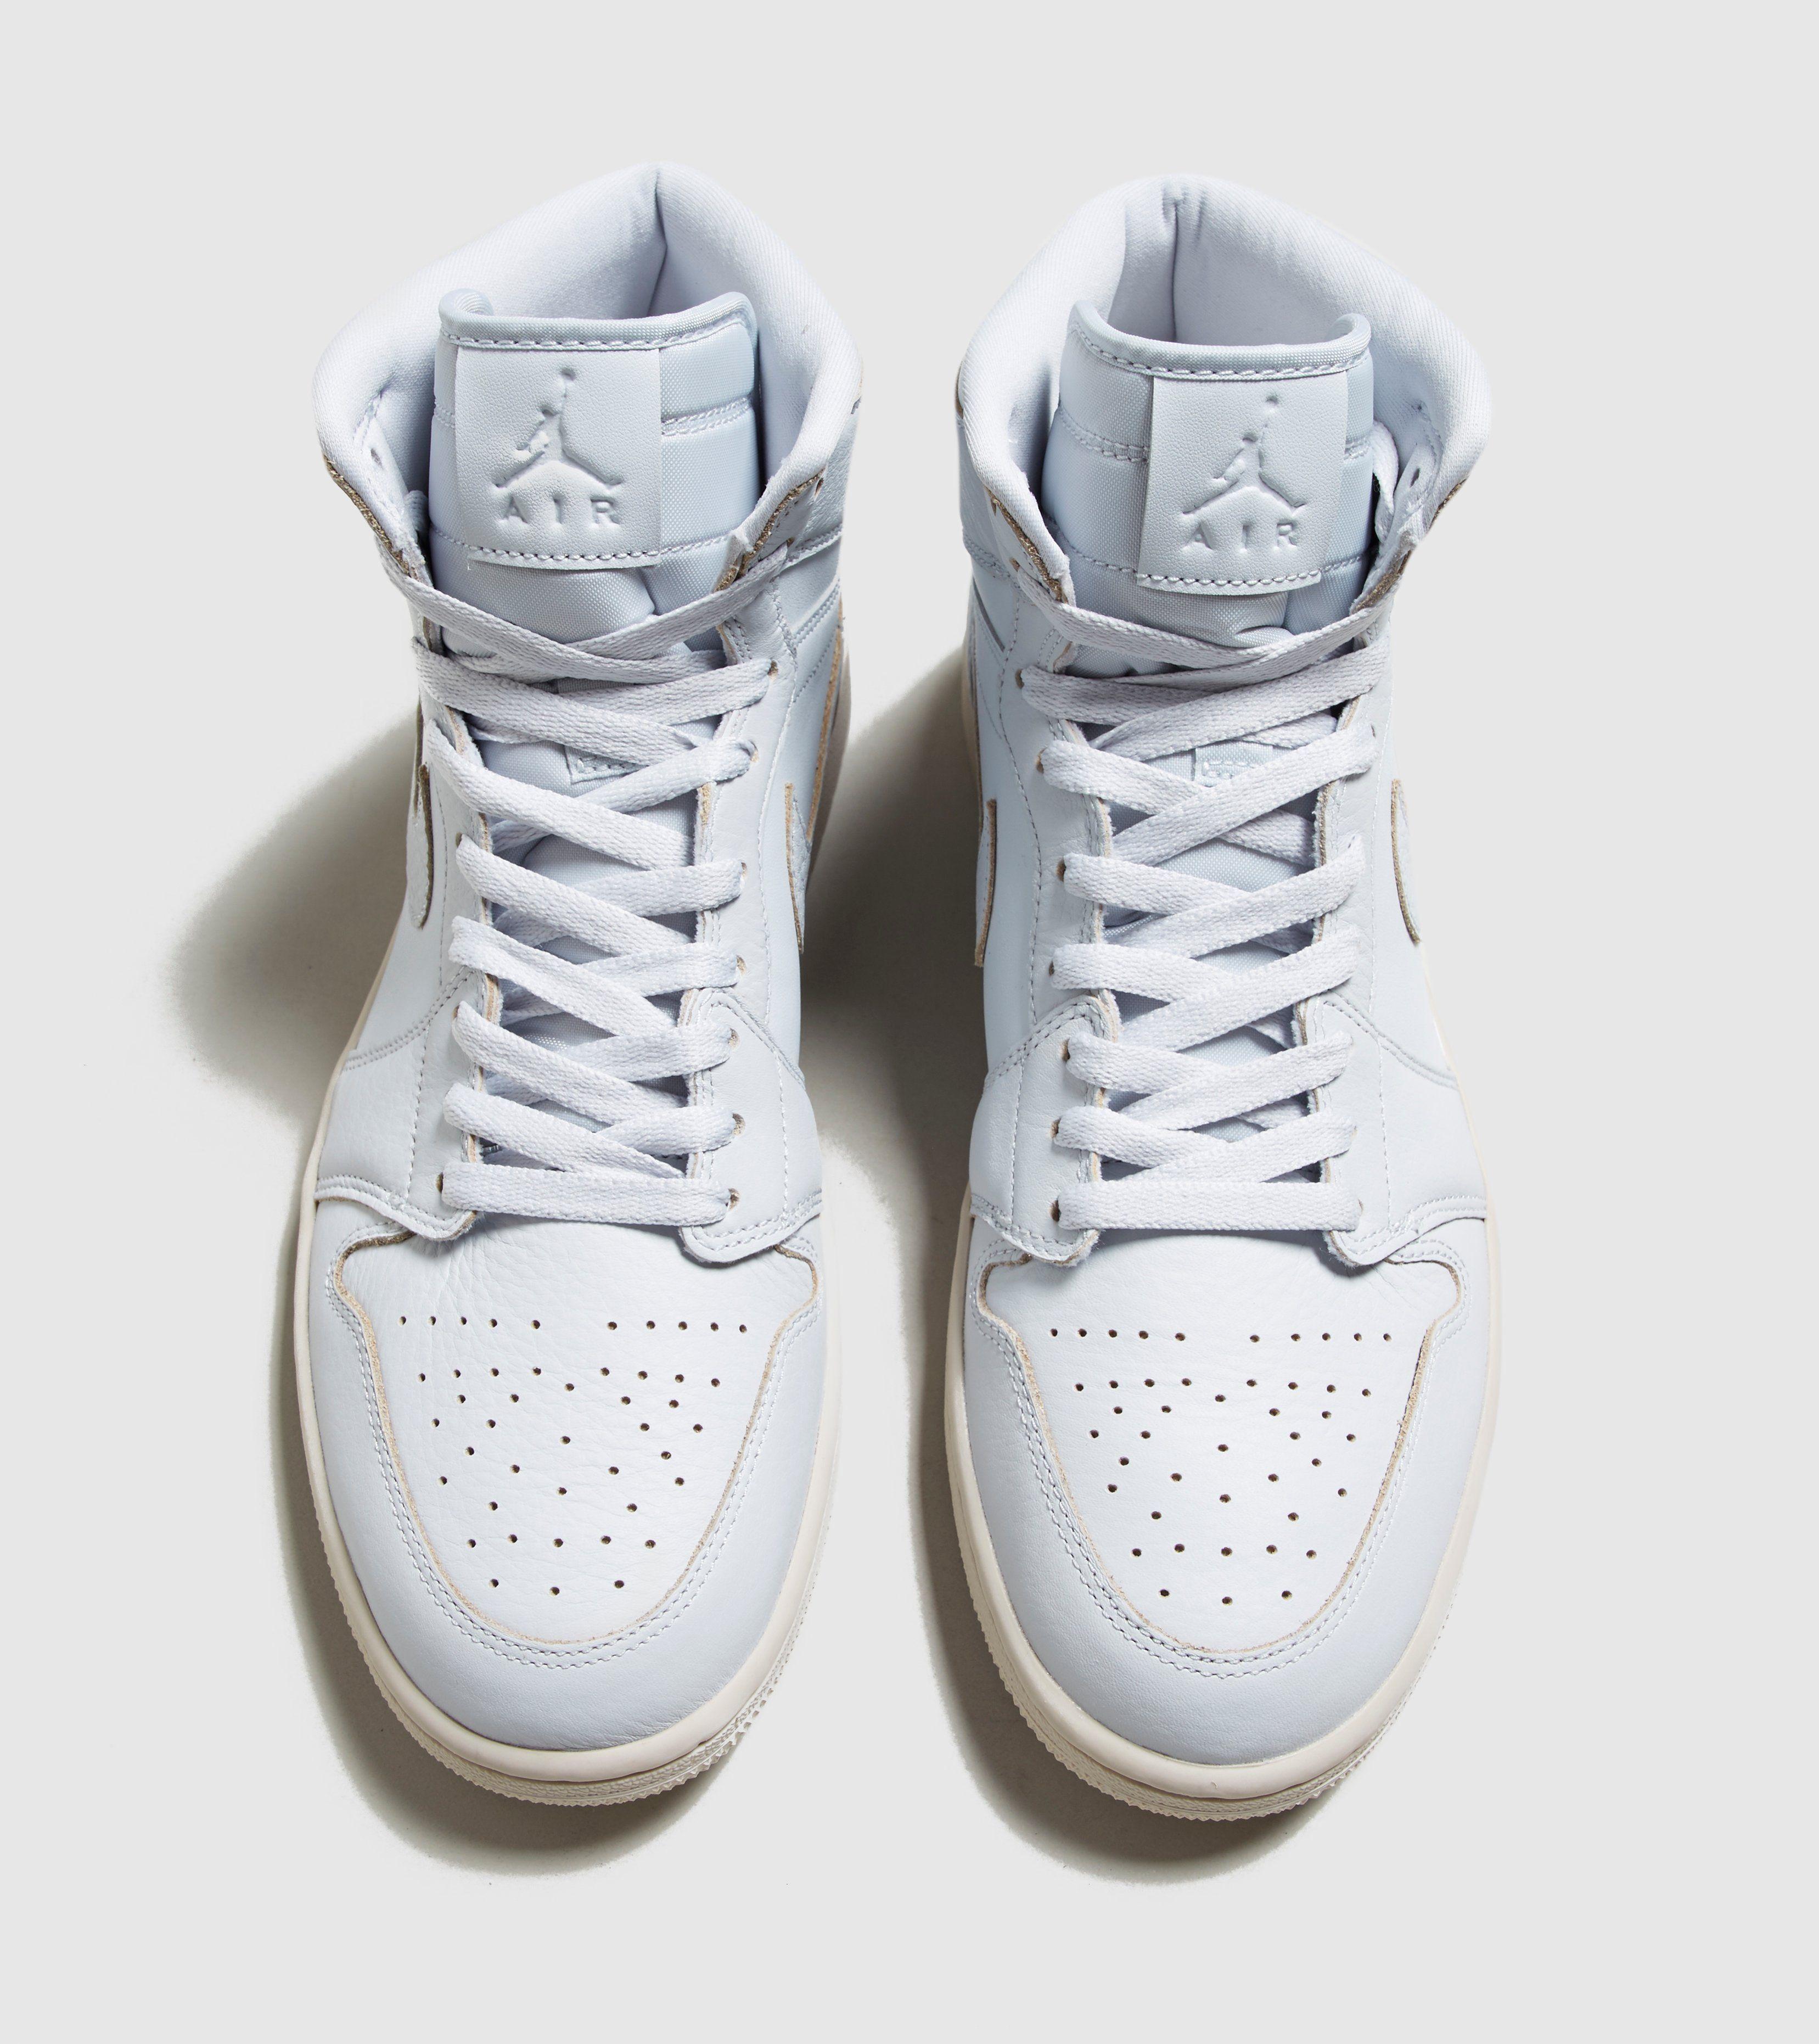 Jordan 1 Retro High